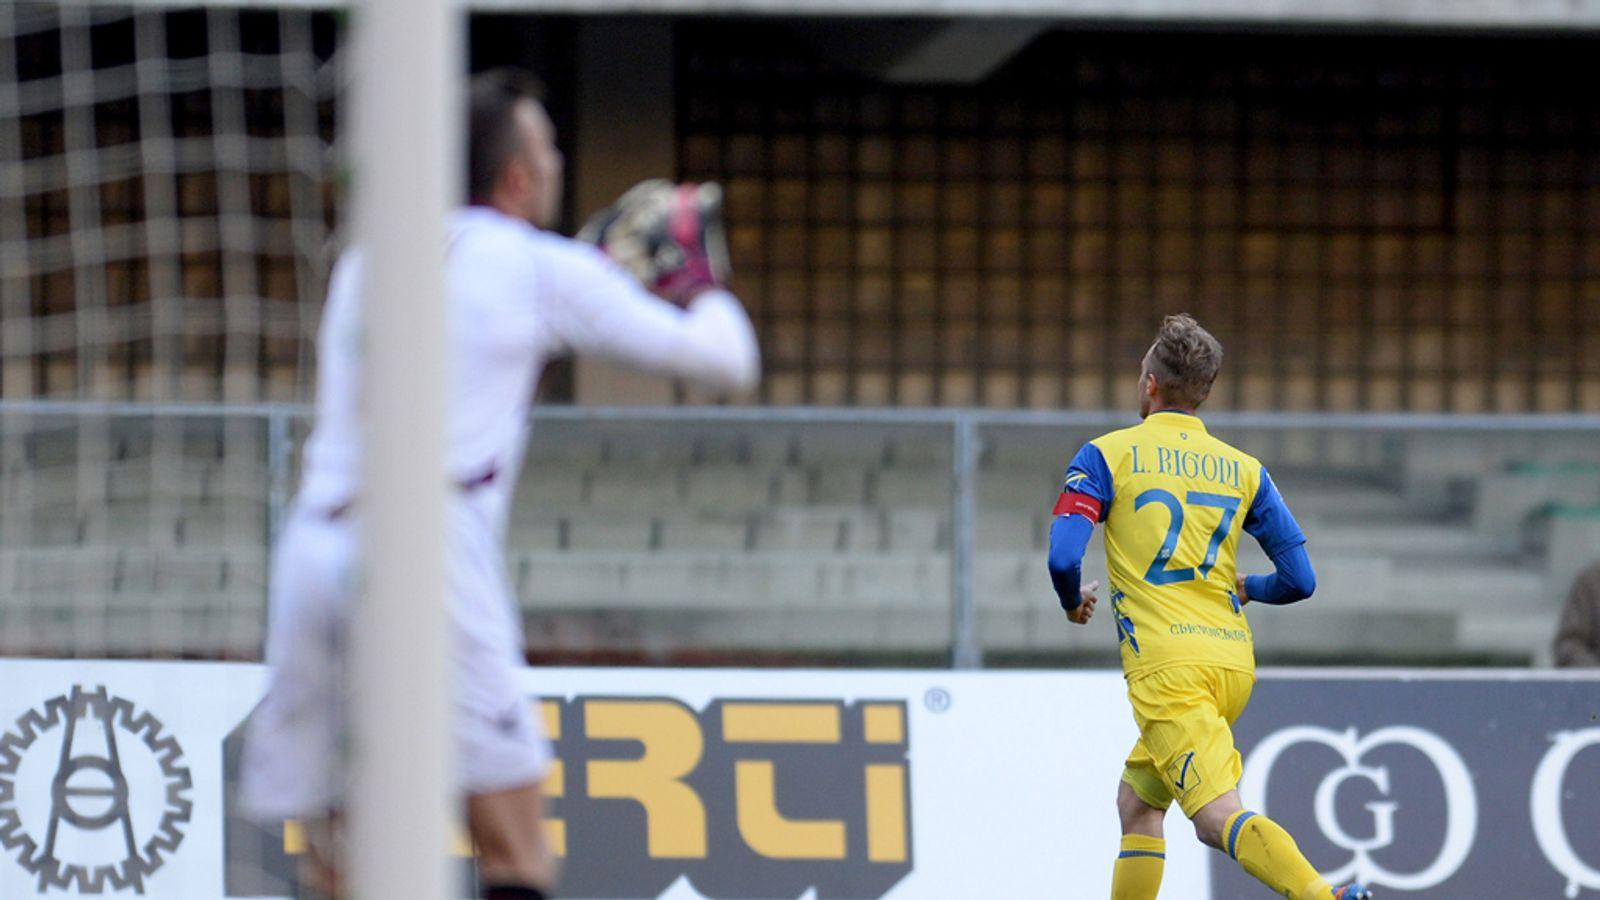 Chievo 3 - 0 Livorno - Match Report & Highlights